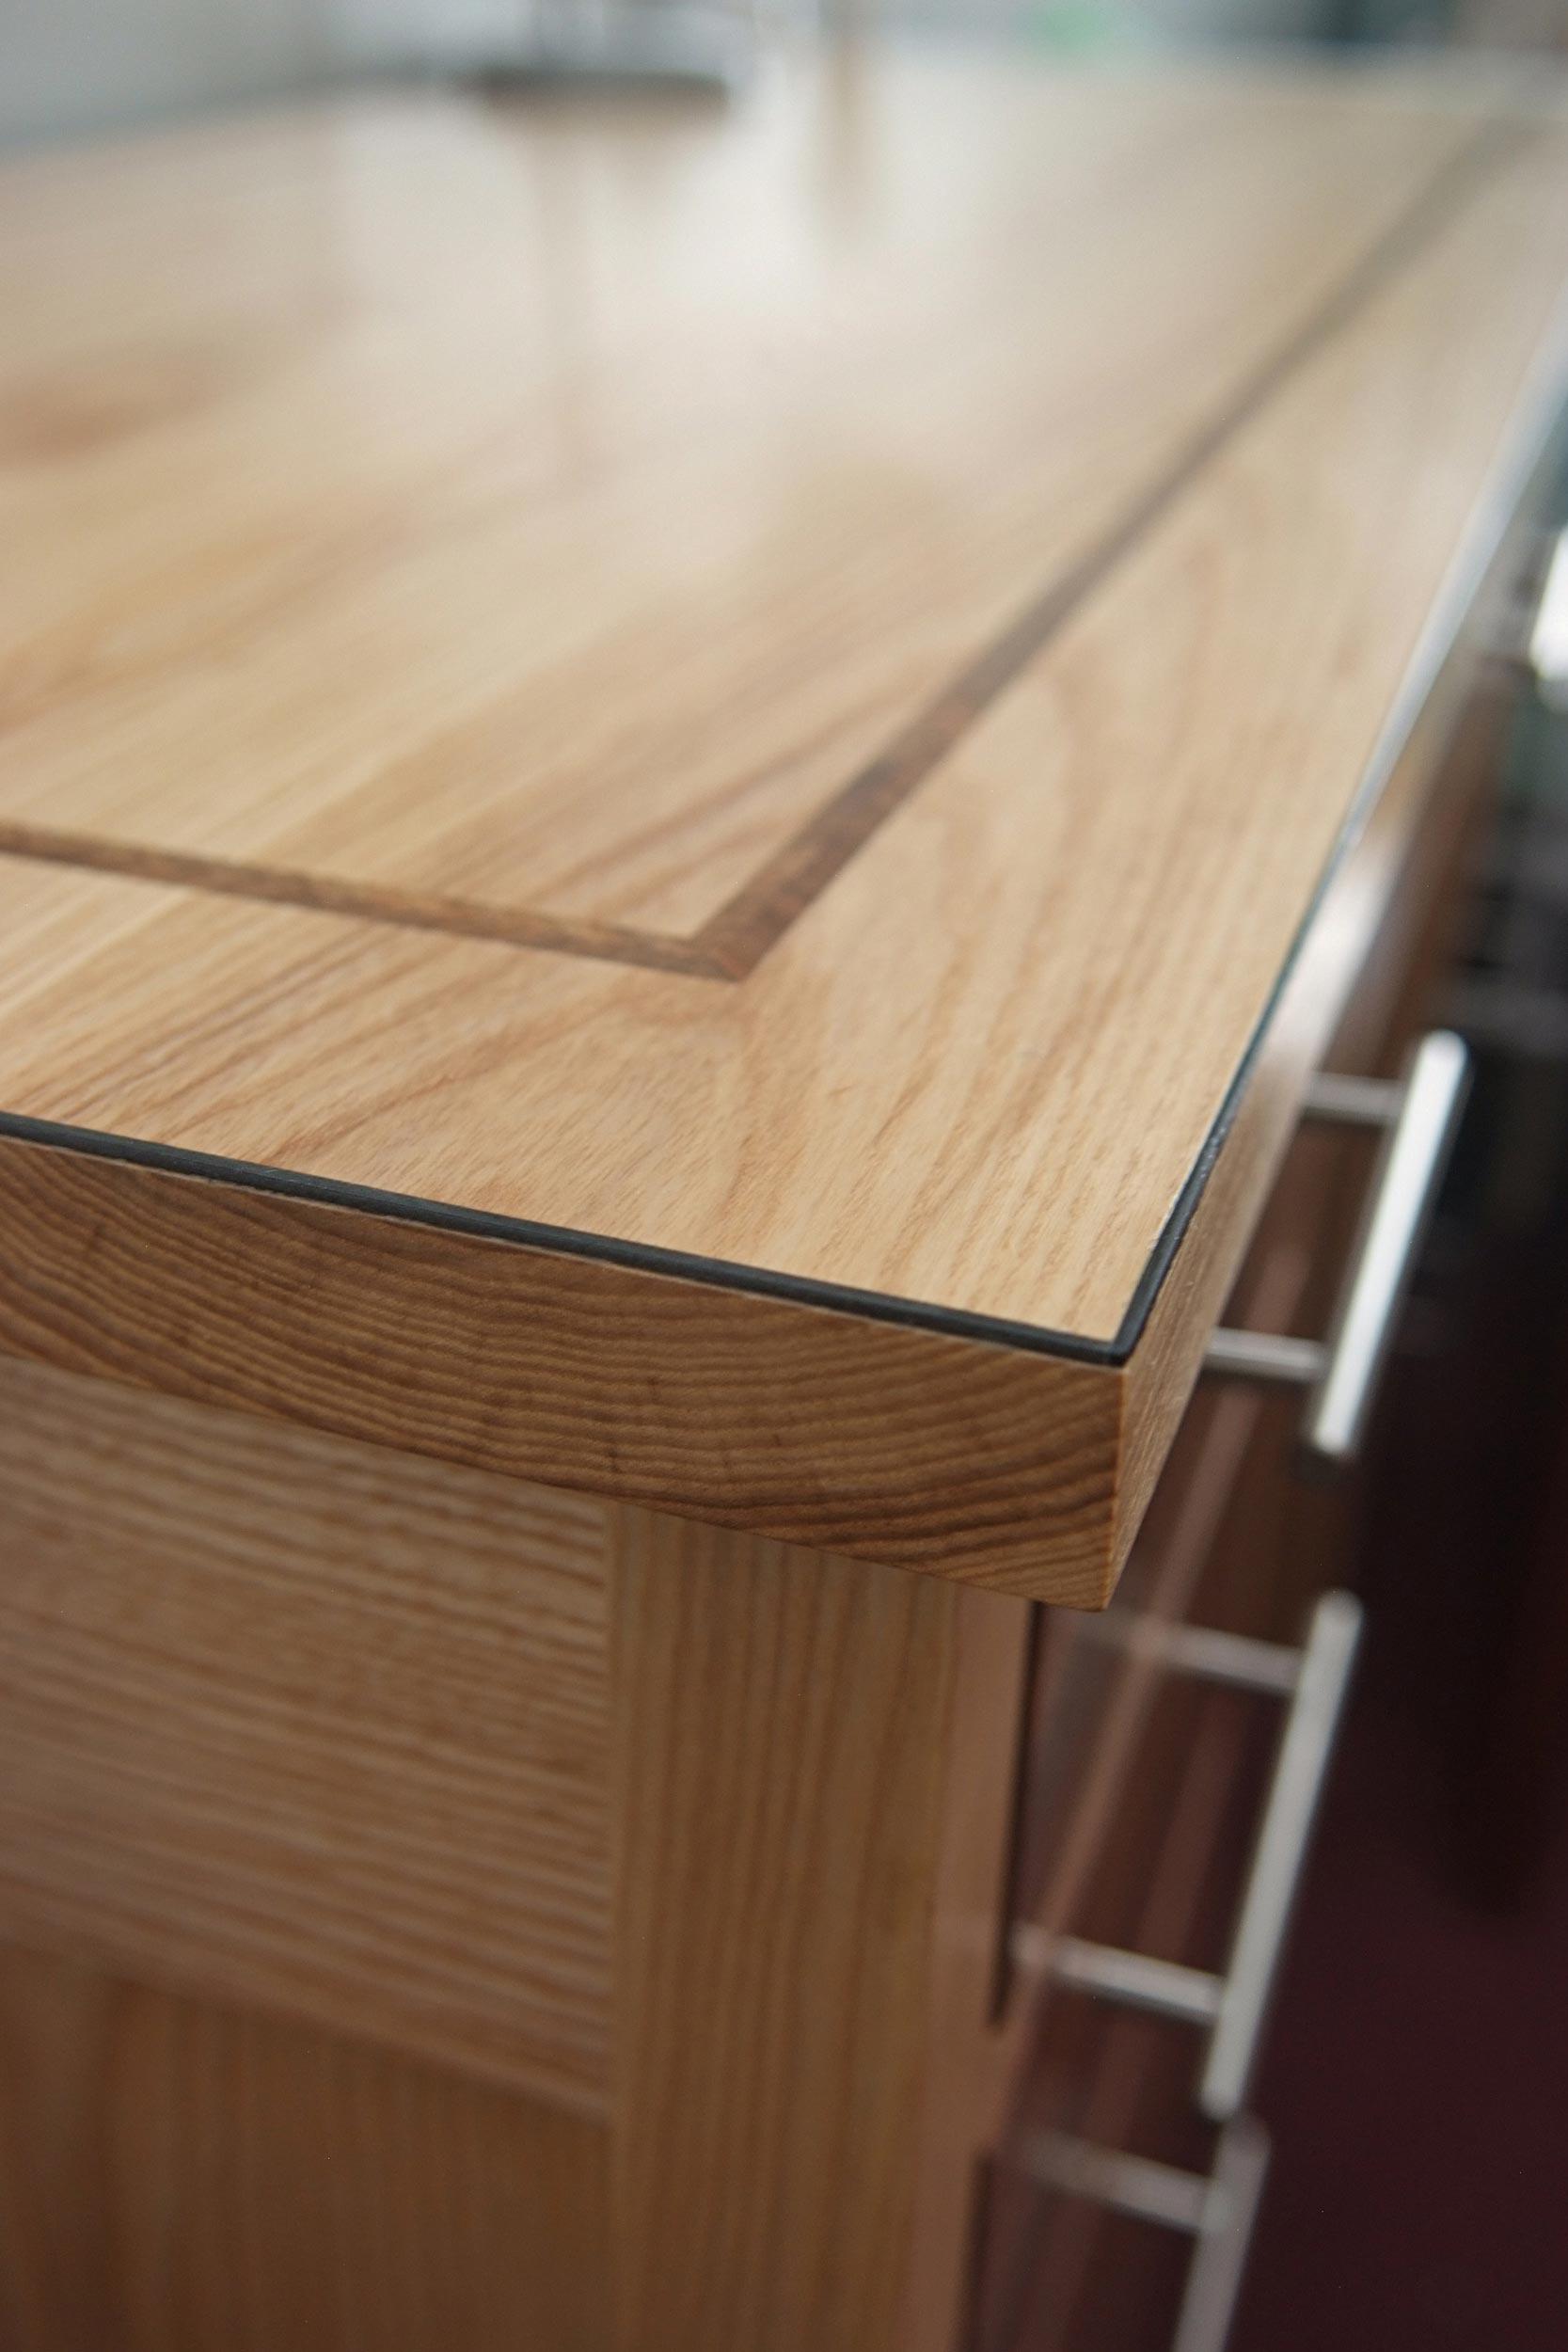 Ash Dressing Table & Stool